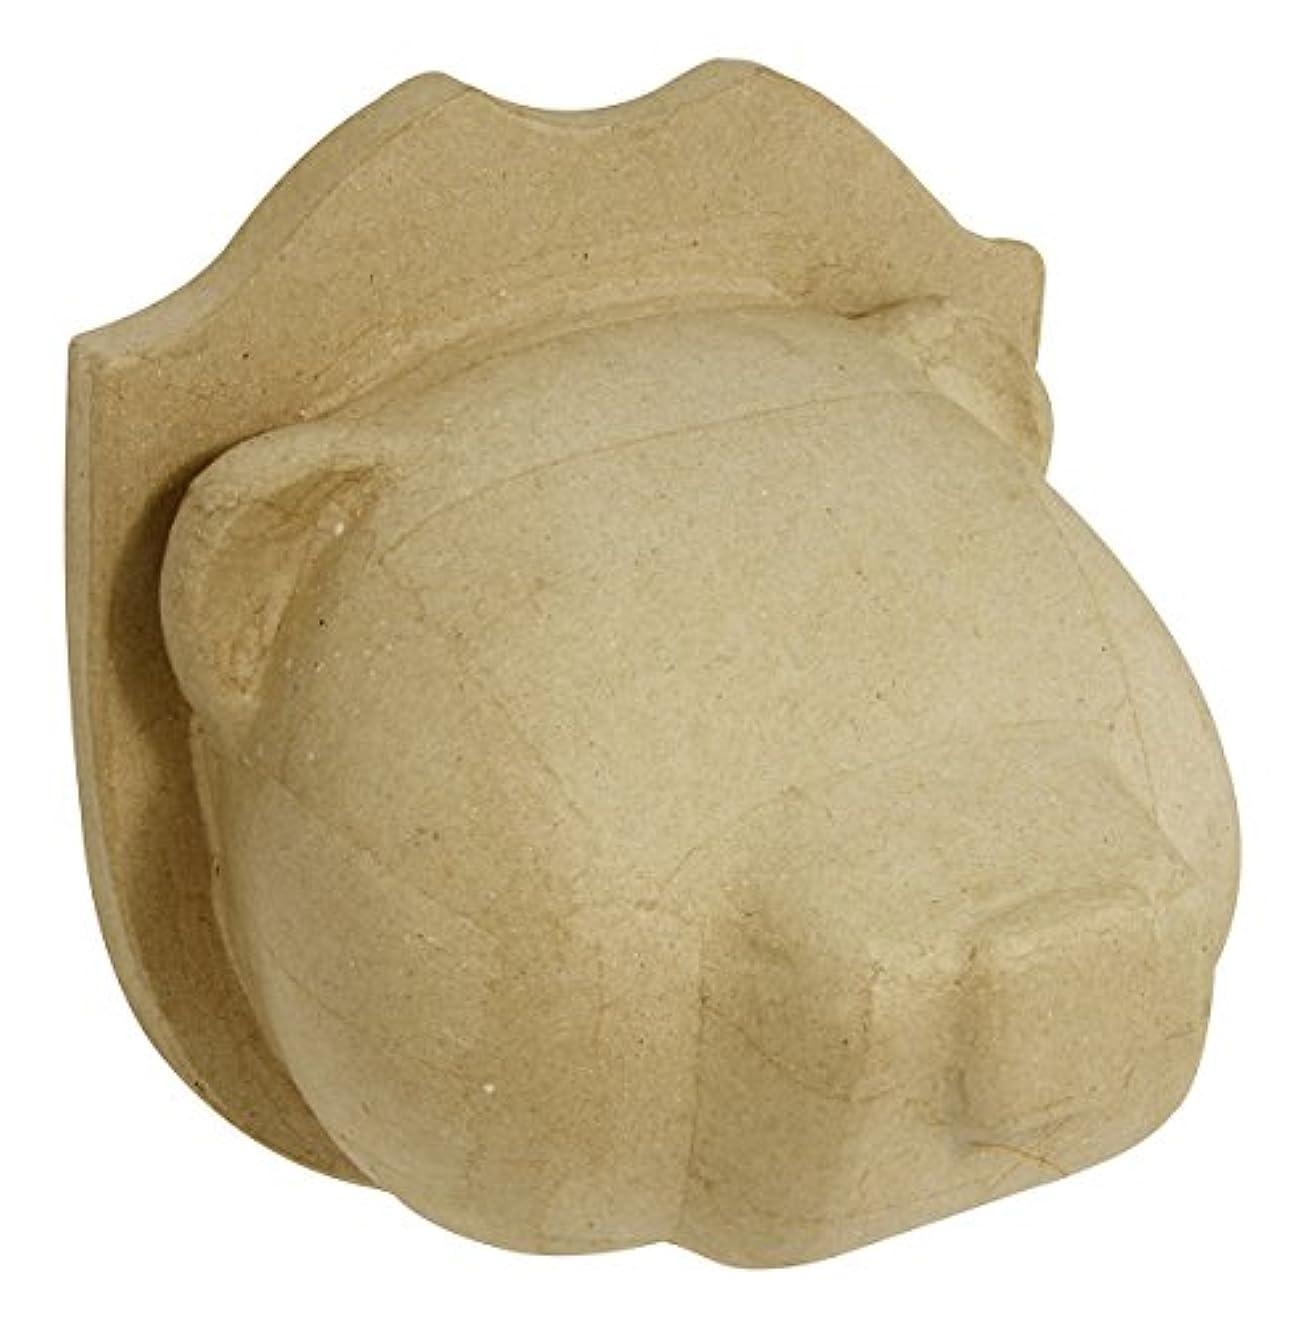 d茅copatch Mache Bear Trophy Head, 11 x 15.3 x 17 cm, Brown